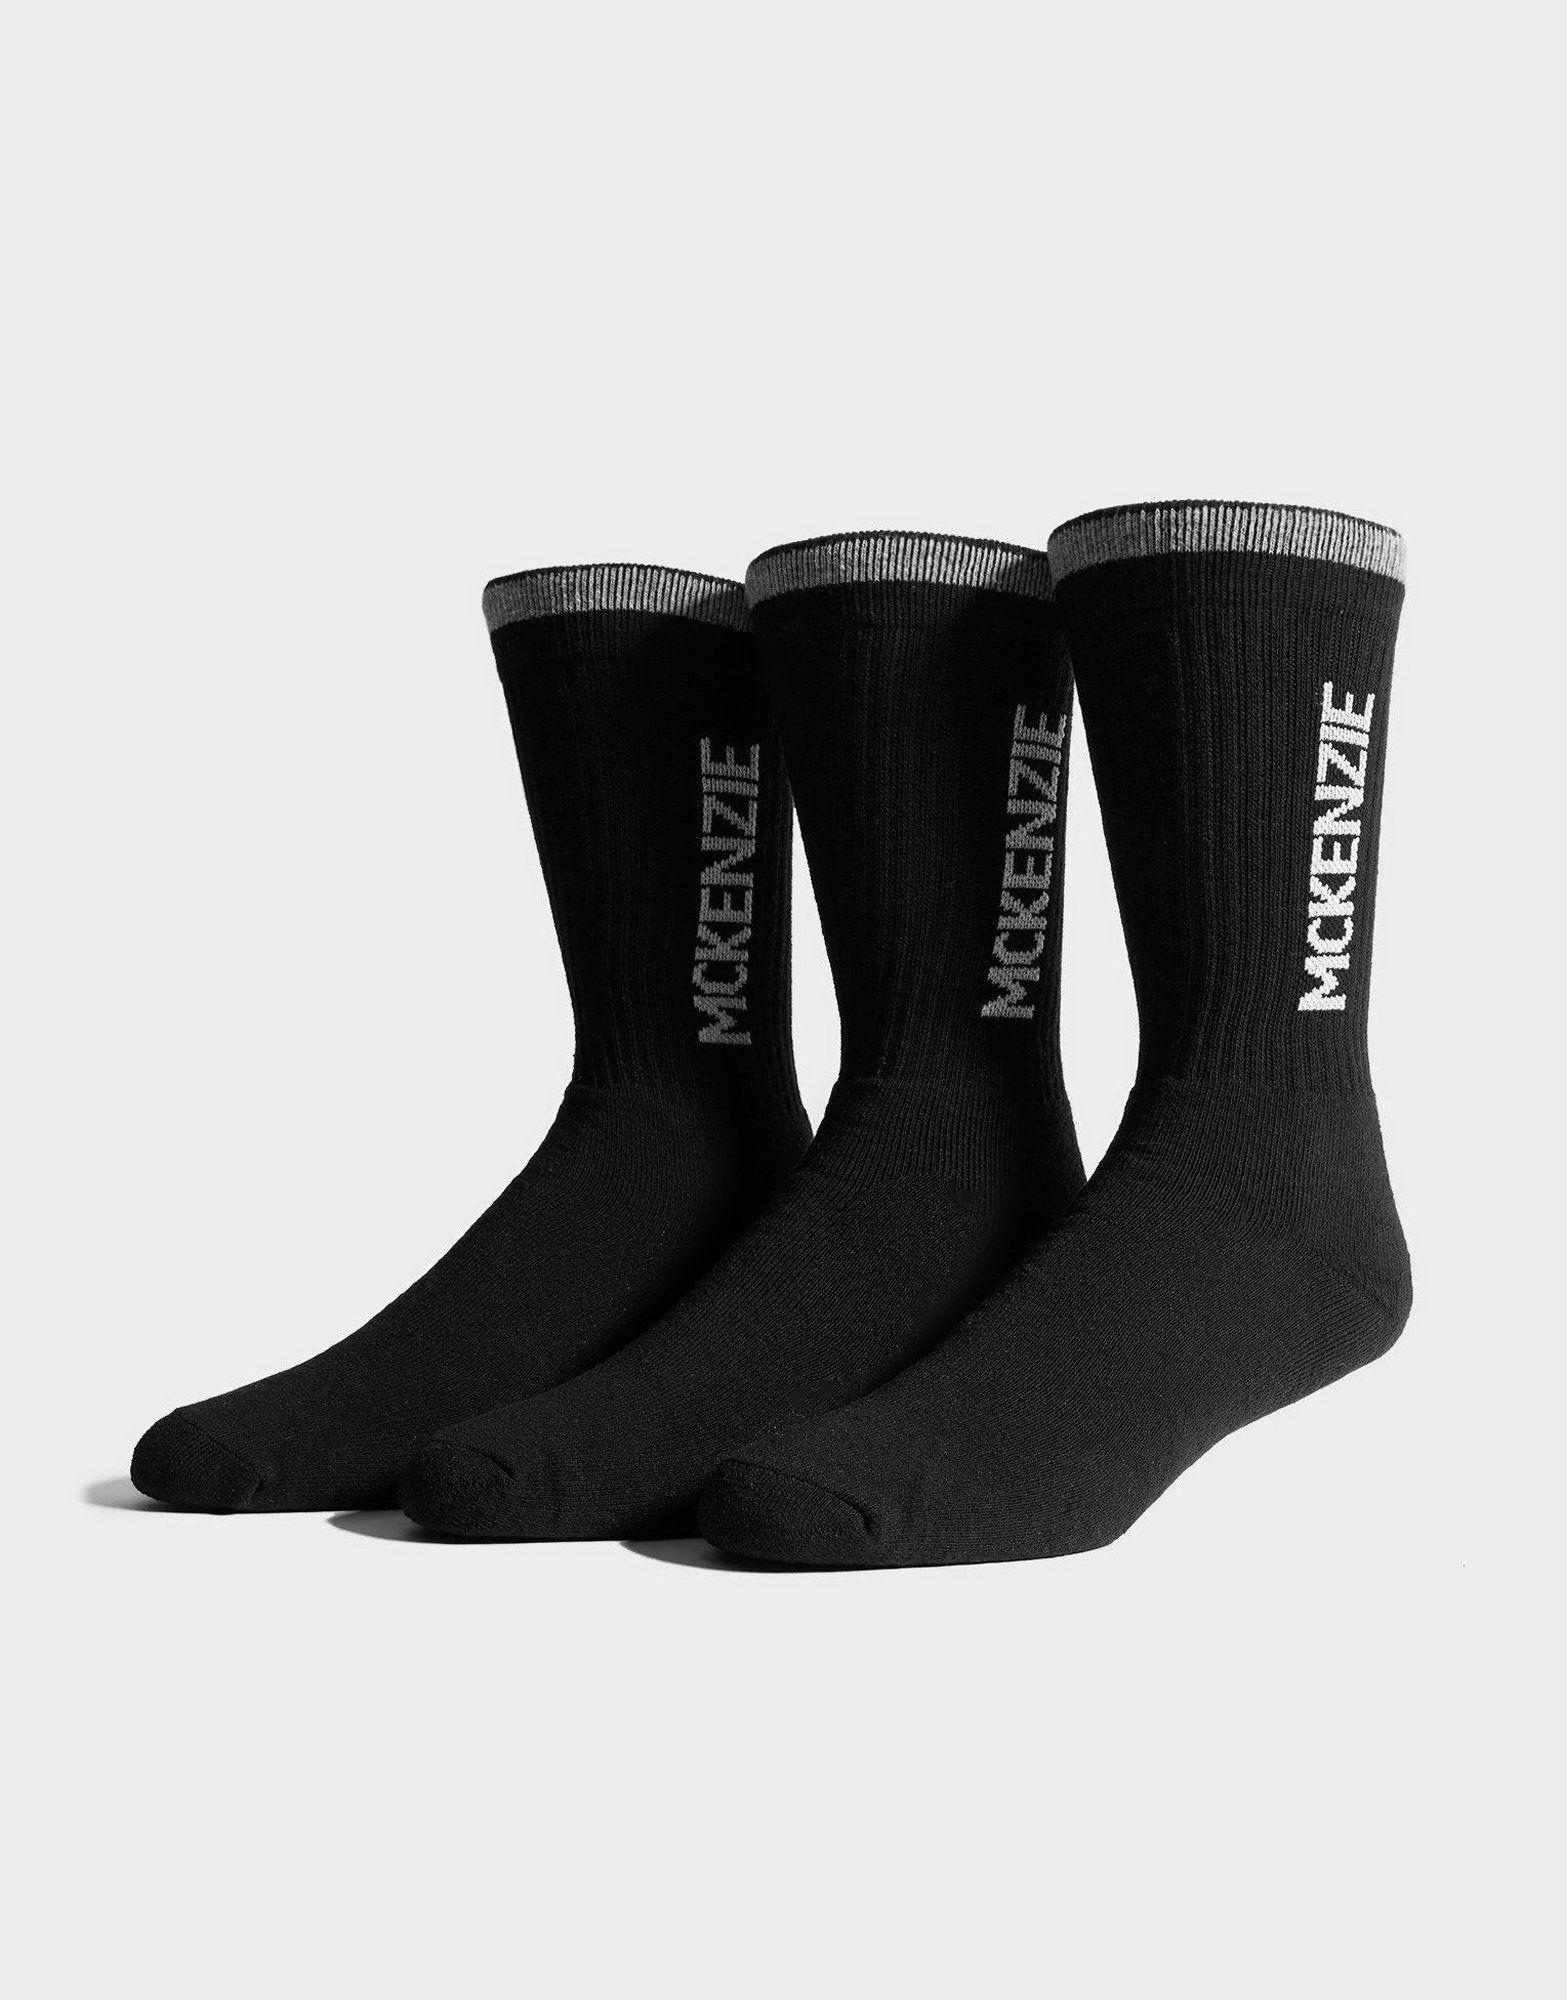 097c284f0115 McKenzie 3 Pack Sport Socks ...